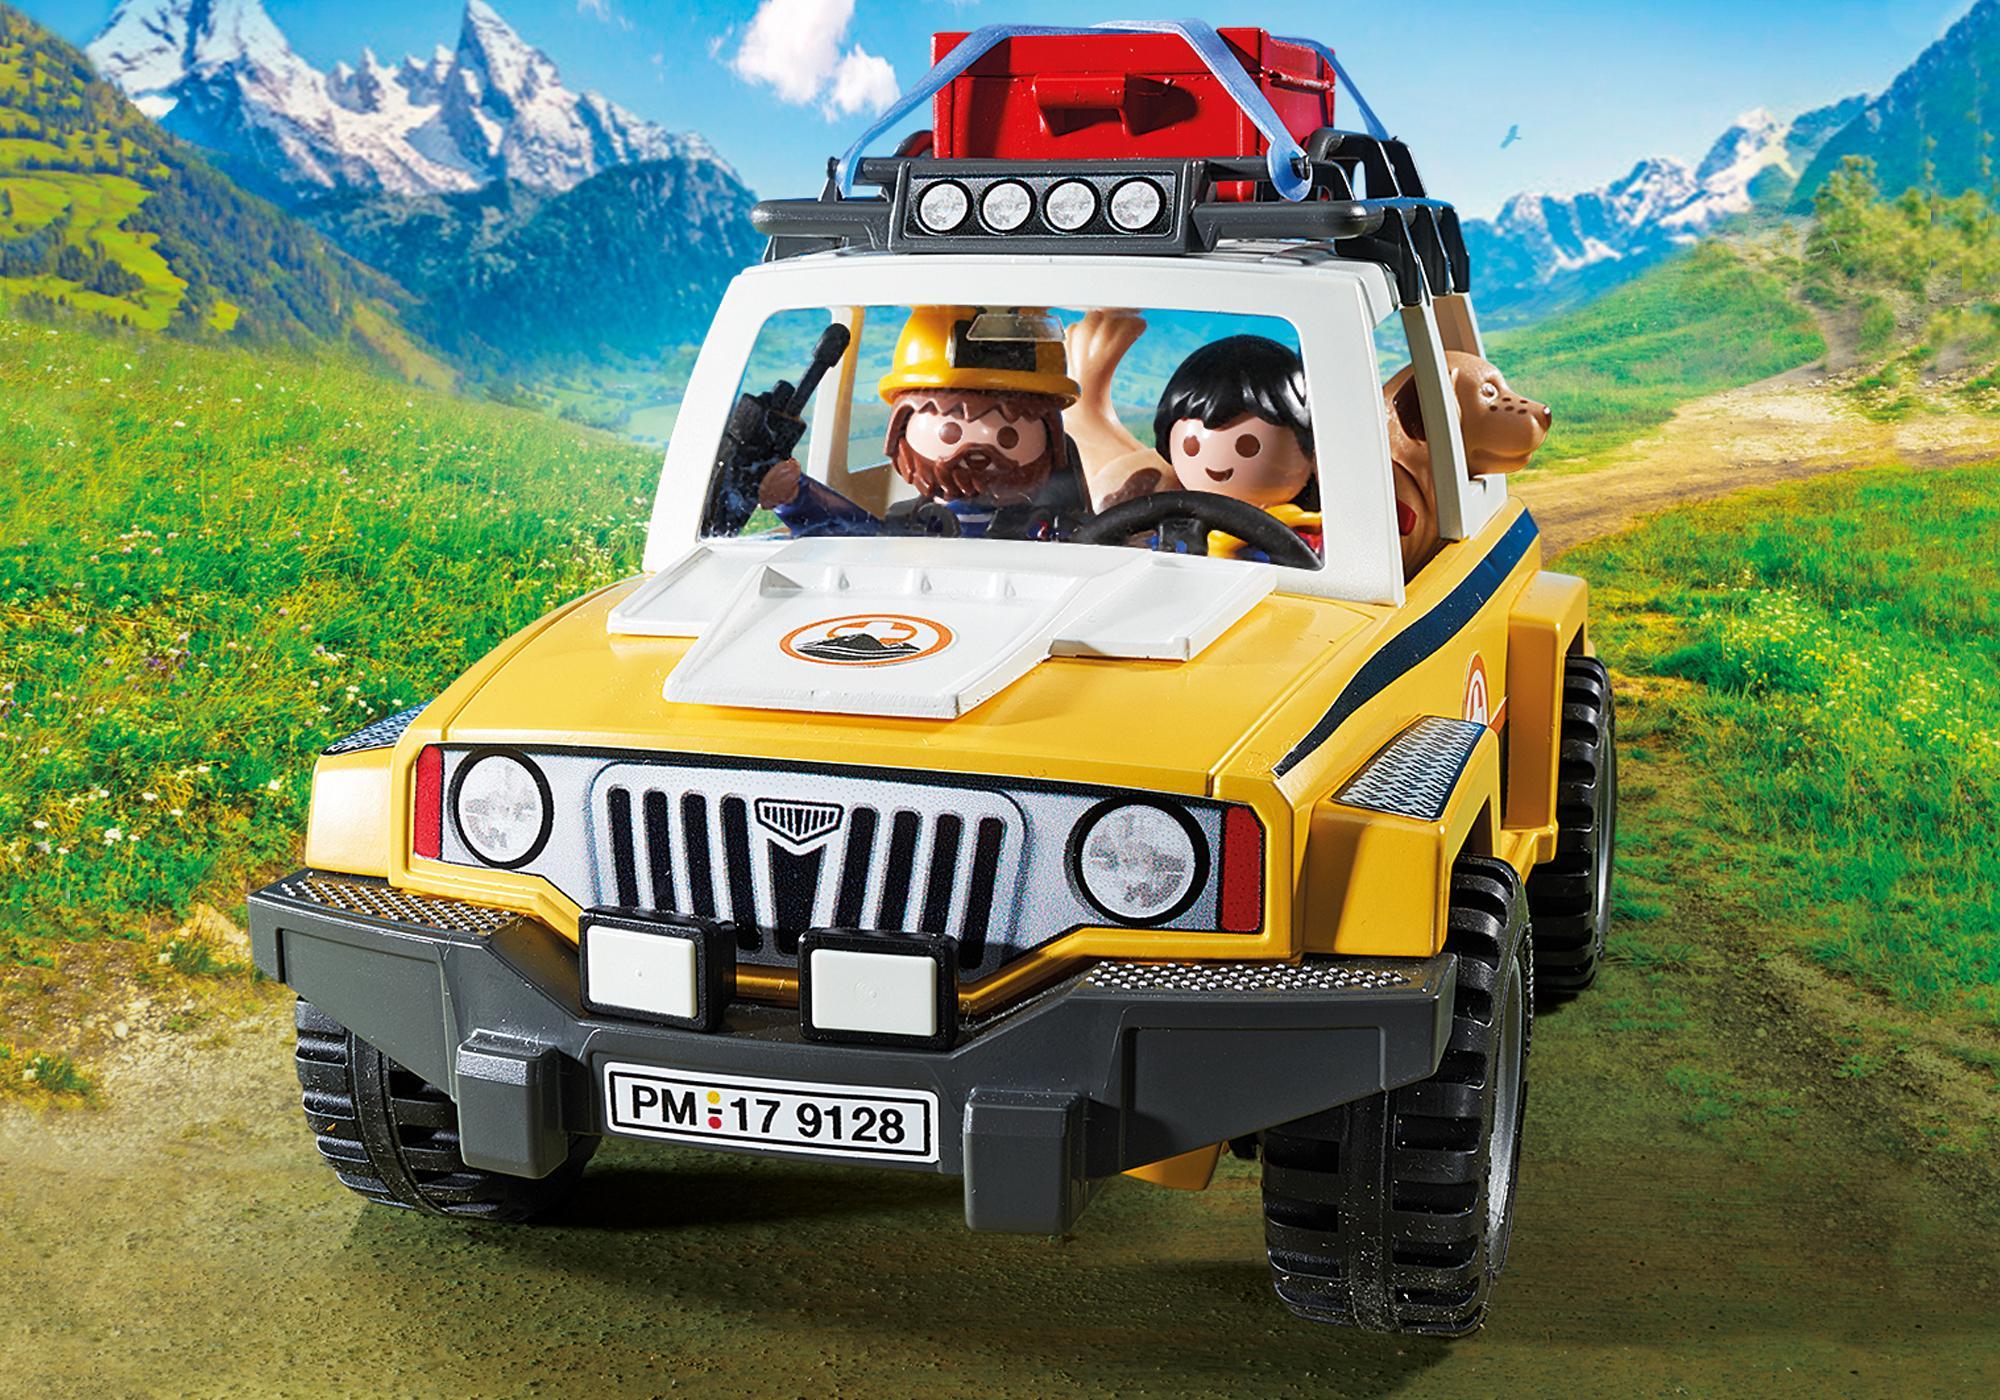 http://media.playmobil.com/i/playmobil/9128_product_extra2/Mountain Rescue Truck